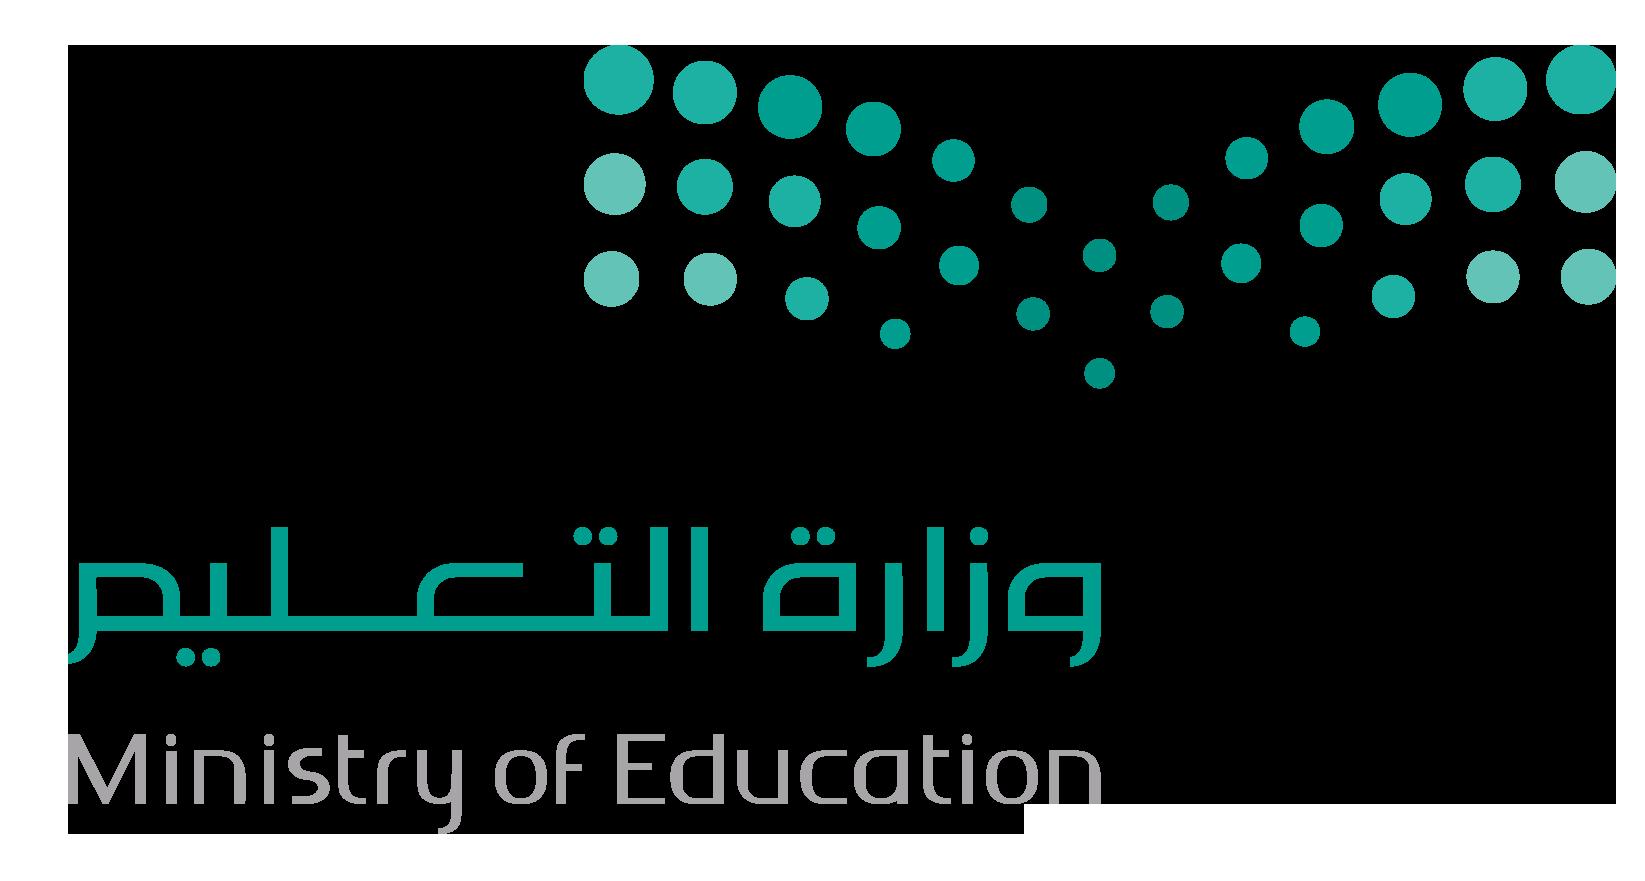 Saudi Arabian Ministry of Education logo